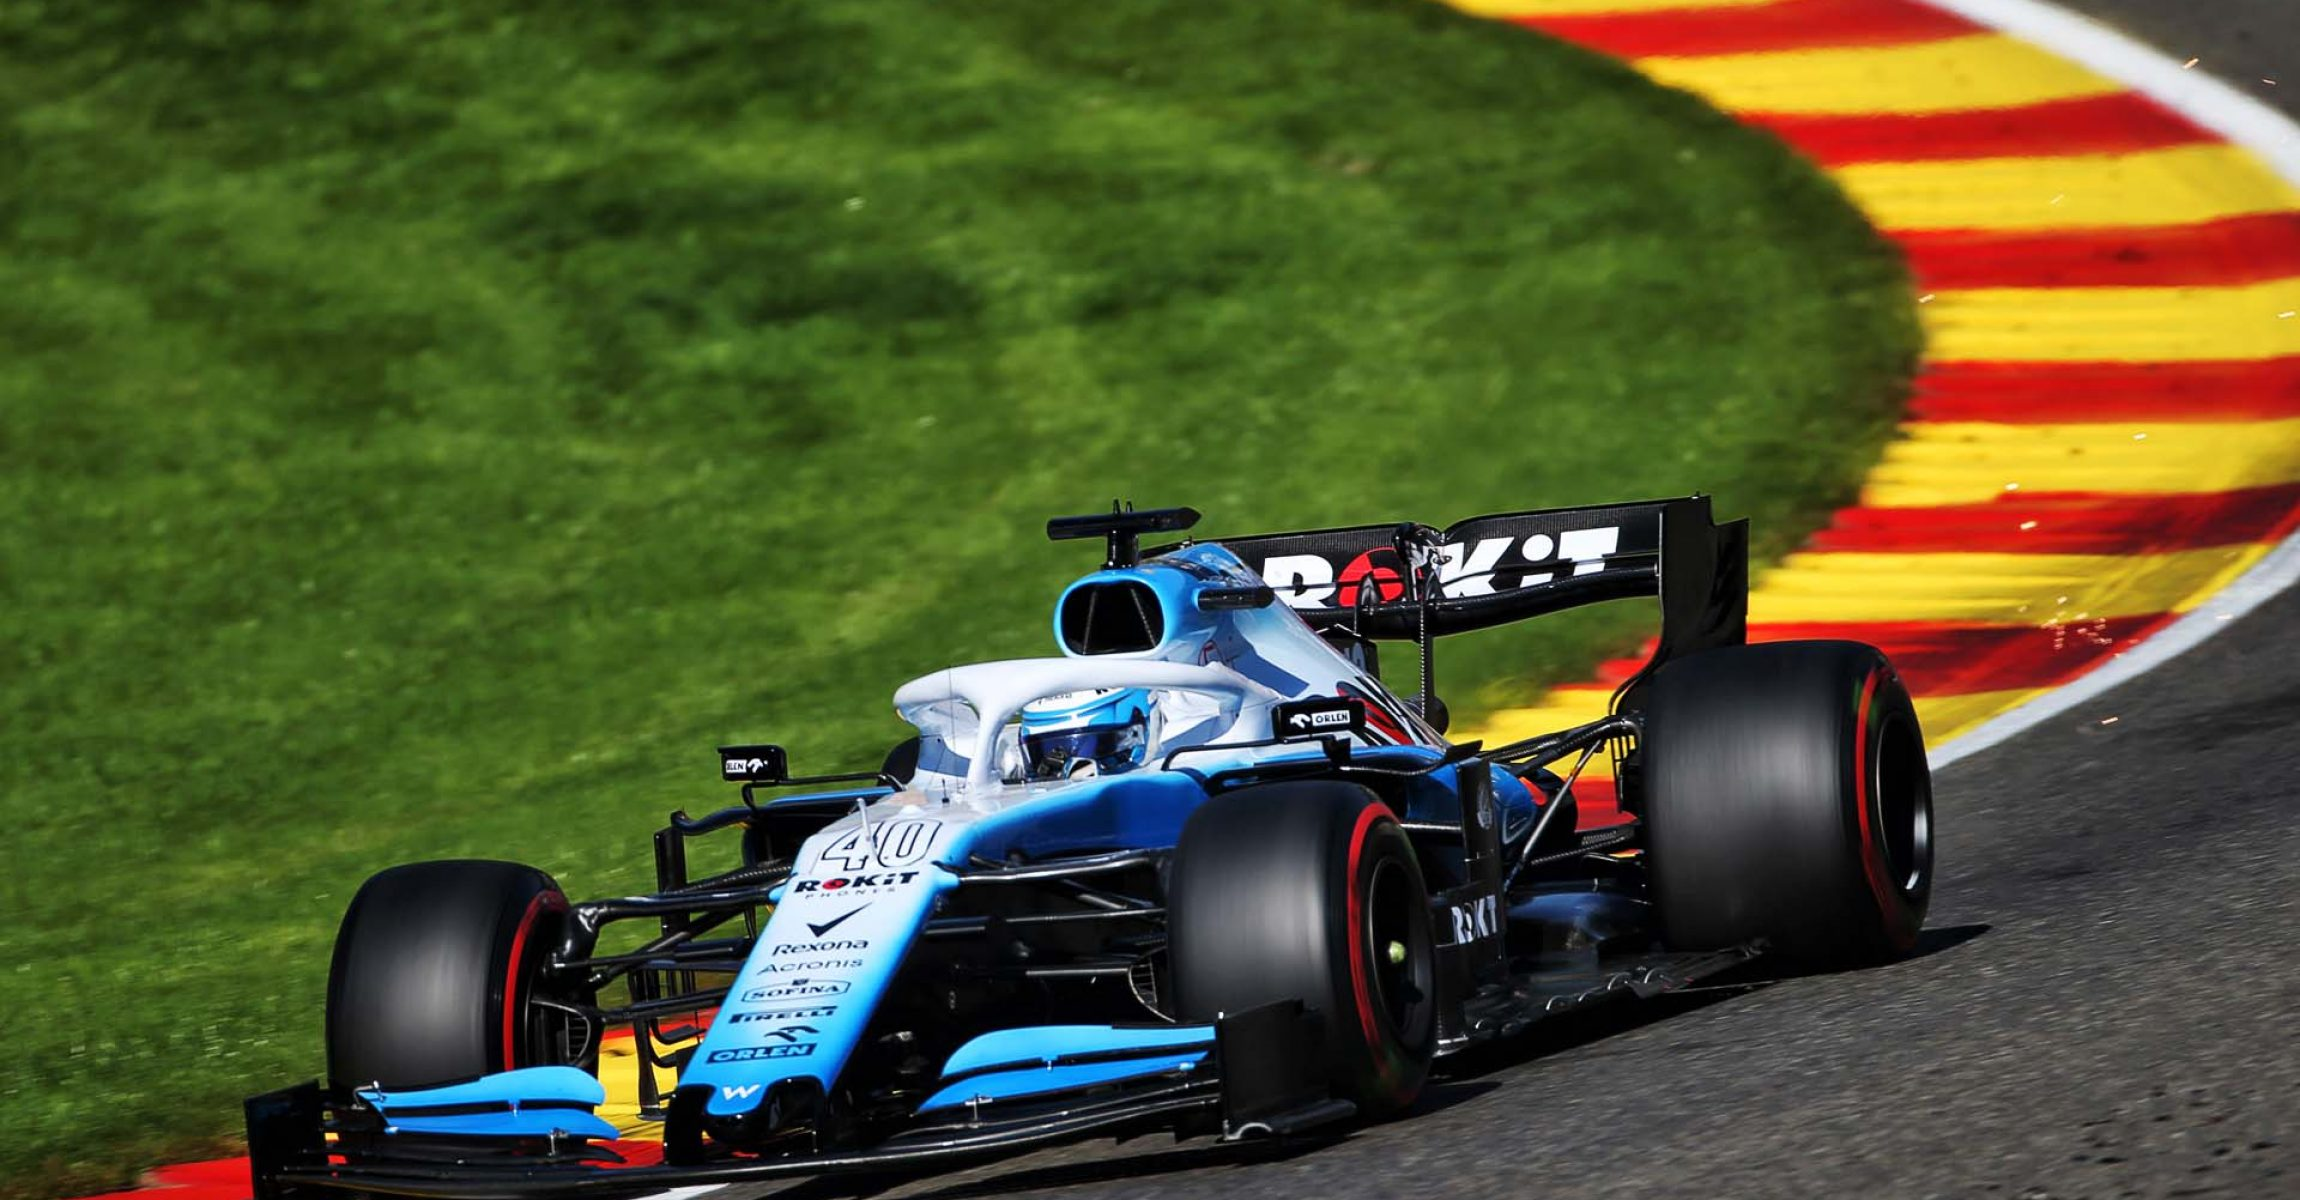 Nicholas Latifi (CDN) Williams Racing FW42 Test and Development Driver. Belgian Grand Prix, Friday 30th August 2019. Spa-Francorchamps, Belgium.